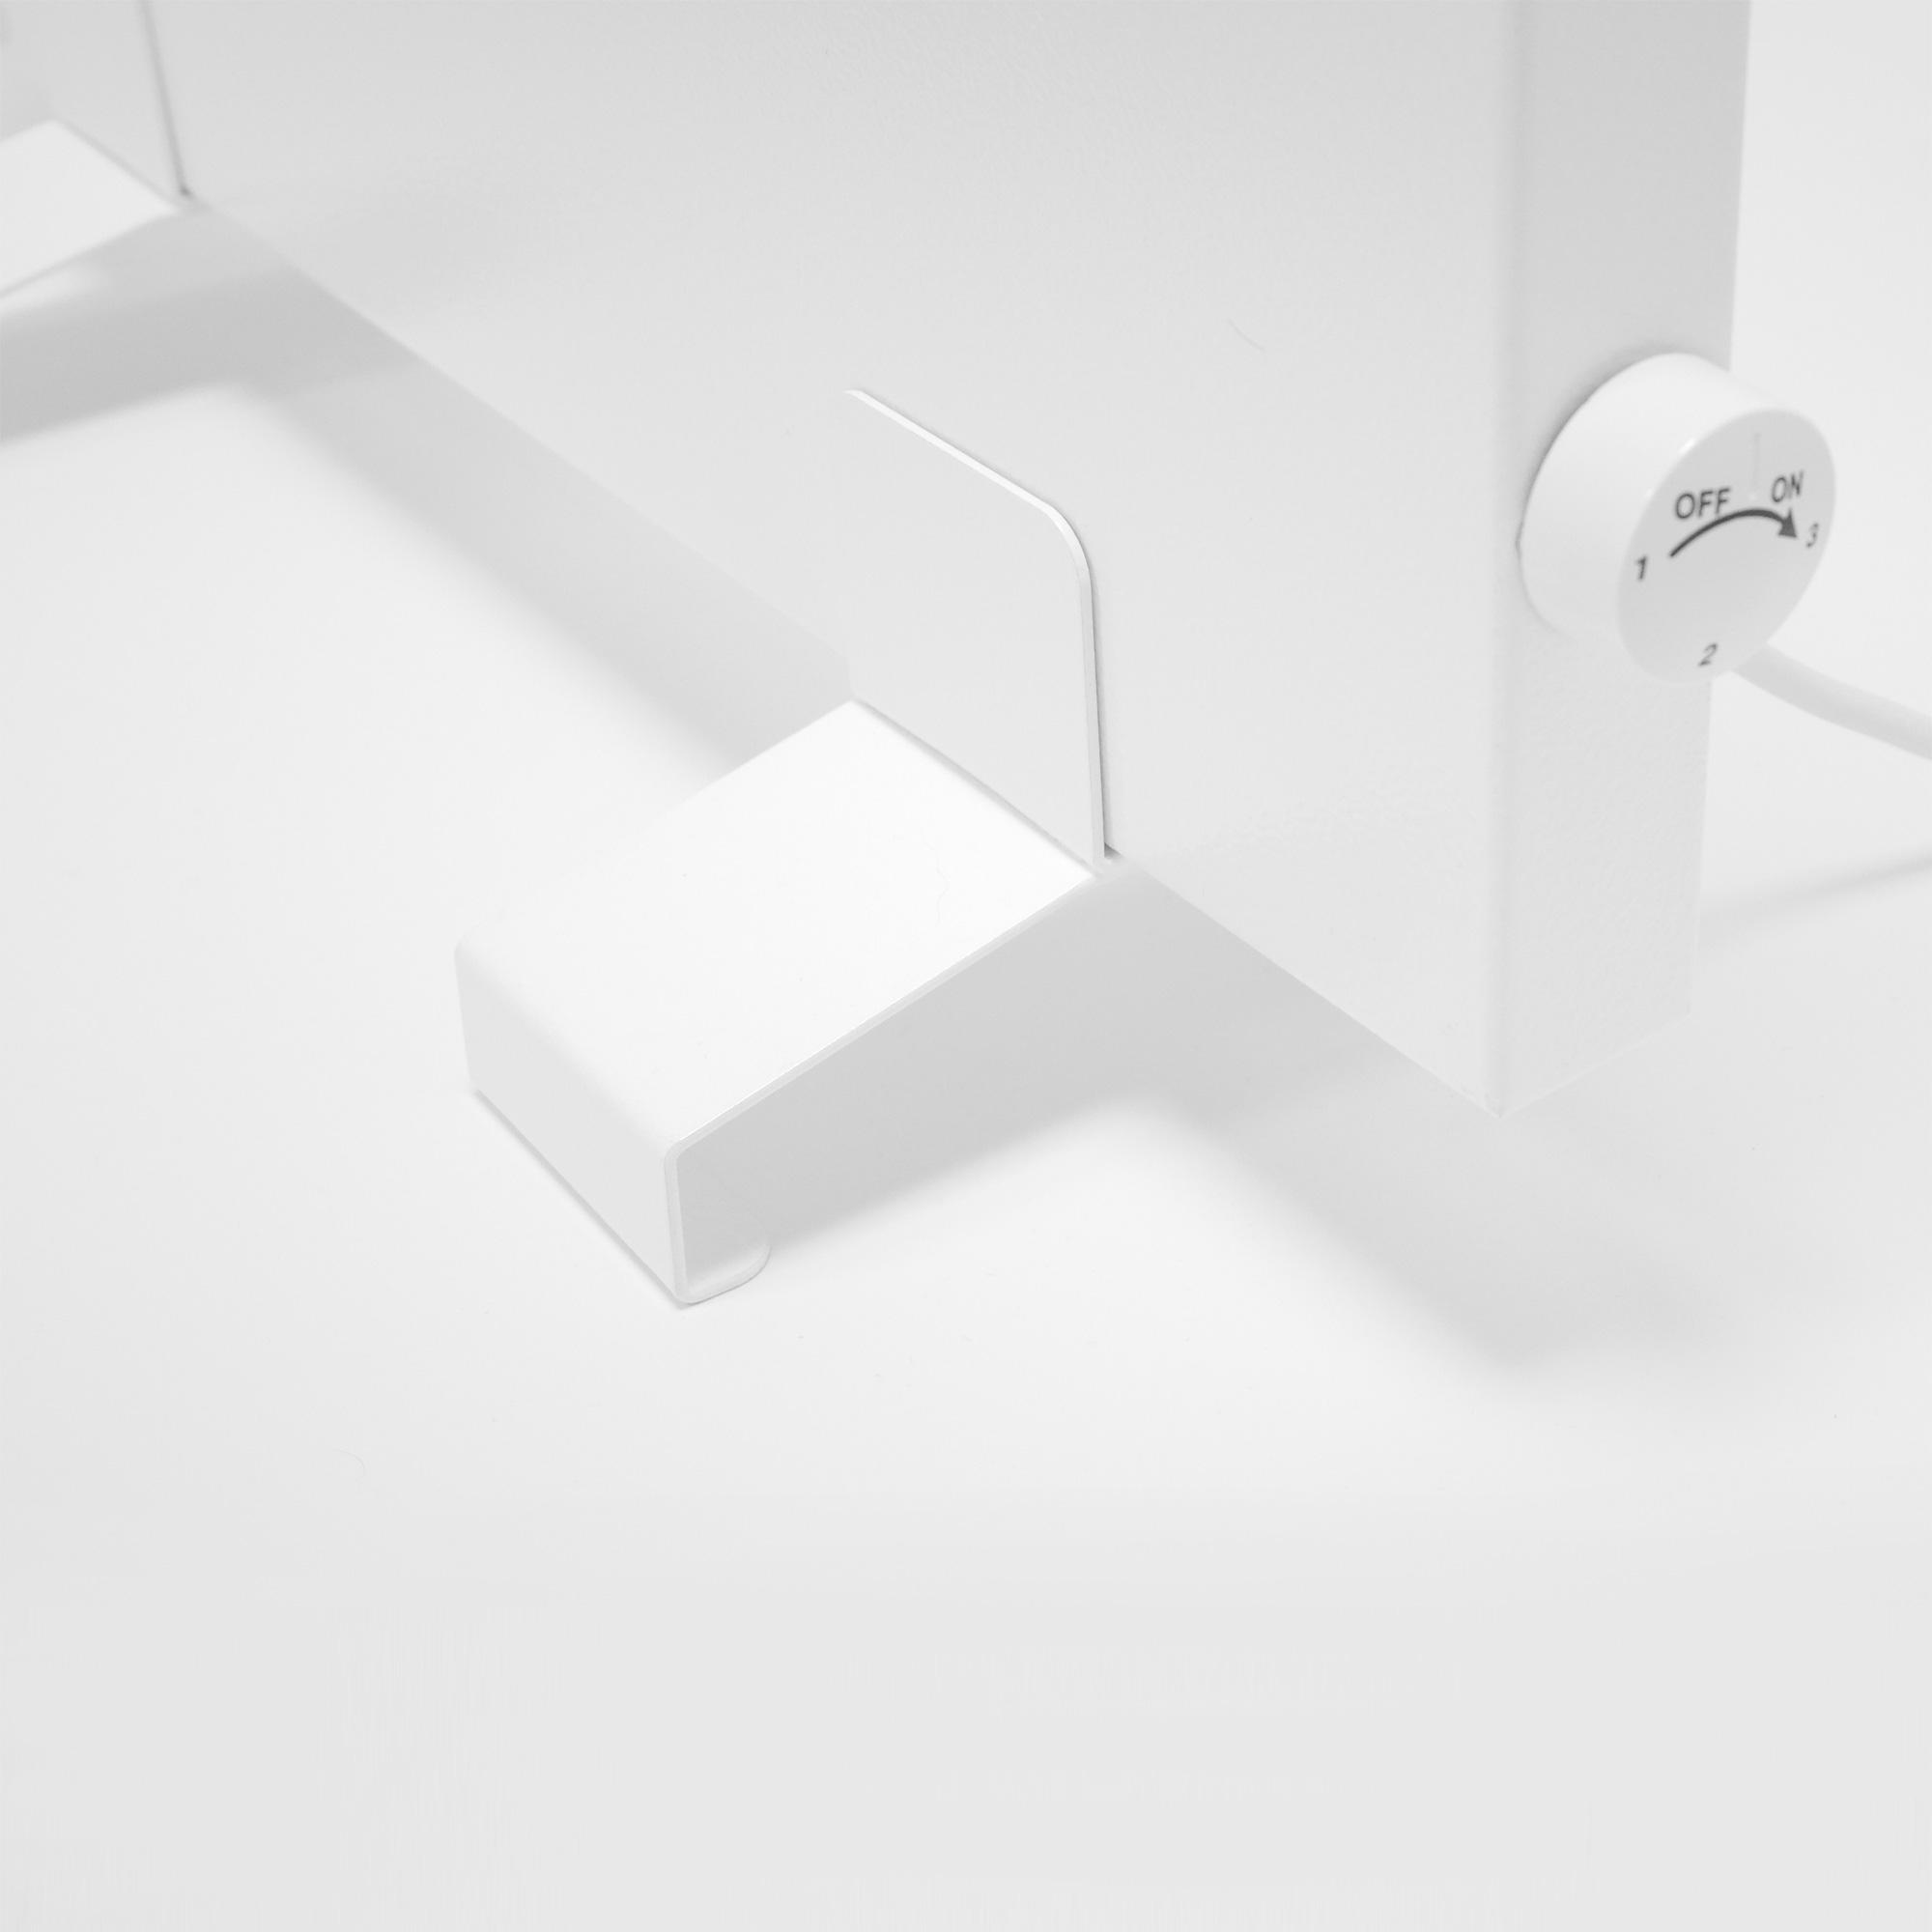 standf e hybrid infrarotheizung vasner konvi manketech gmbh. Black Bedroom Furniture Sets. Home Design Ideas